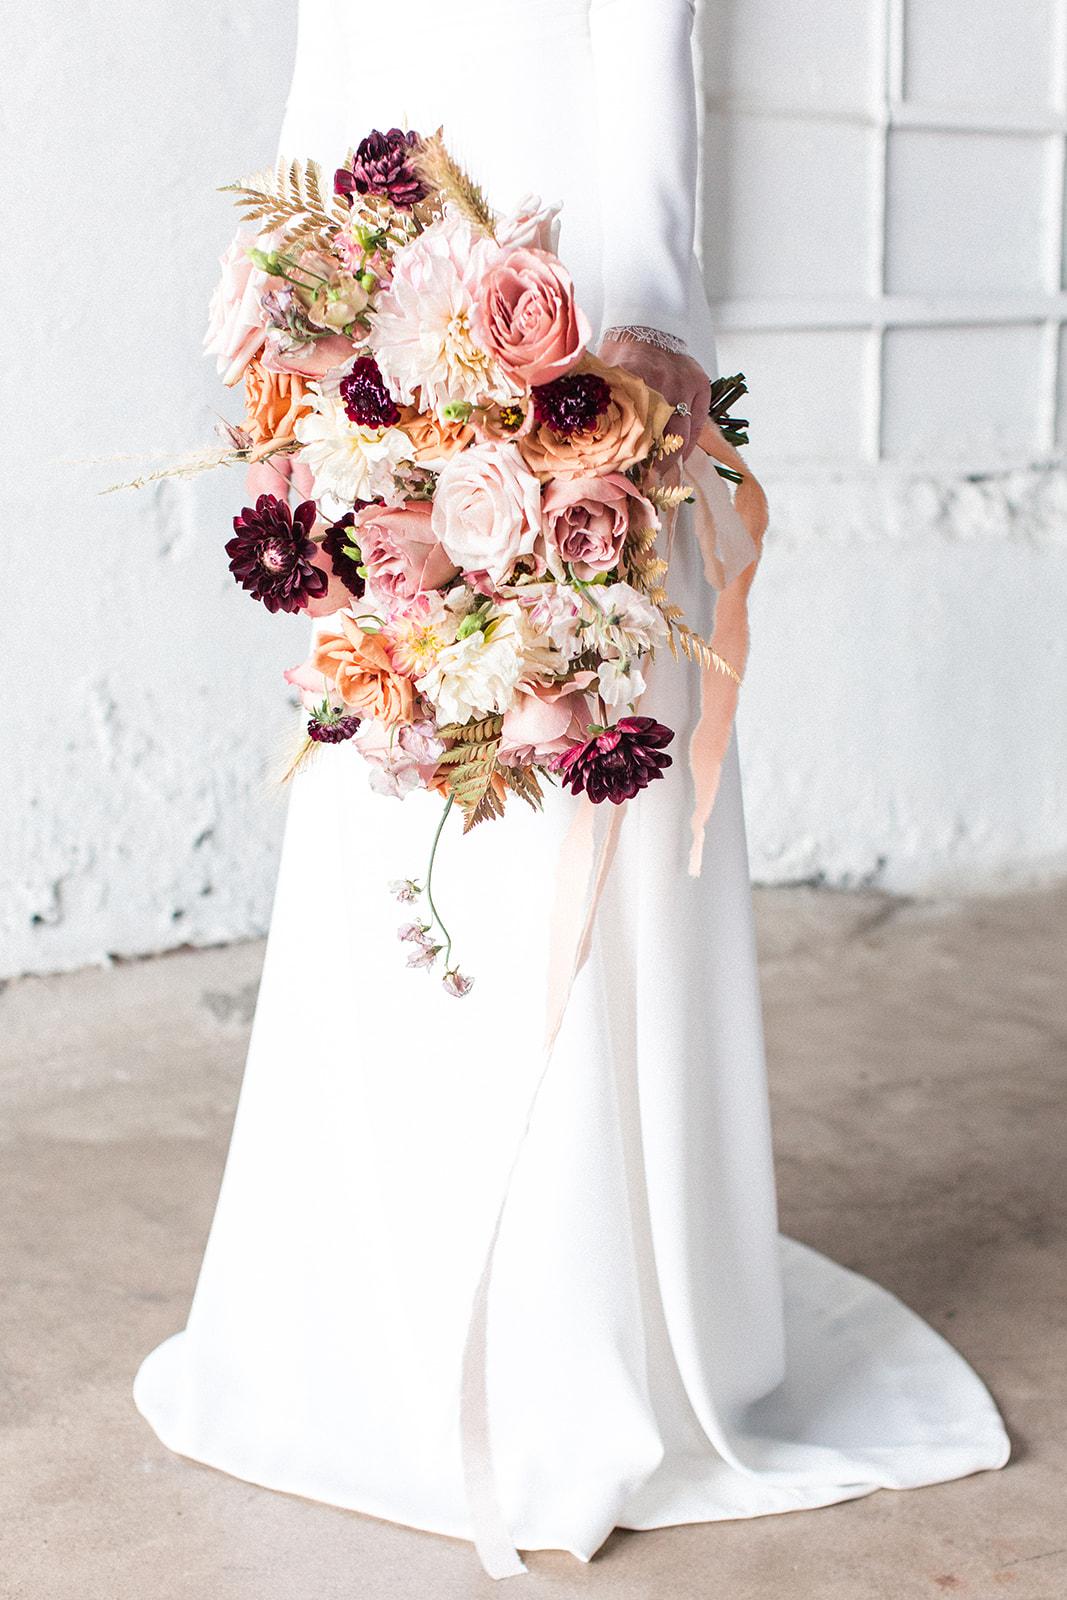 Girly fall wedding bouquet: Fall Garden Wedding featured on Alexa Kay Events